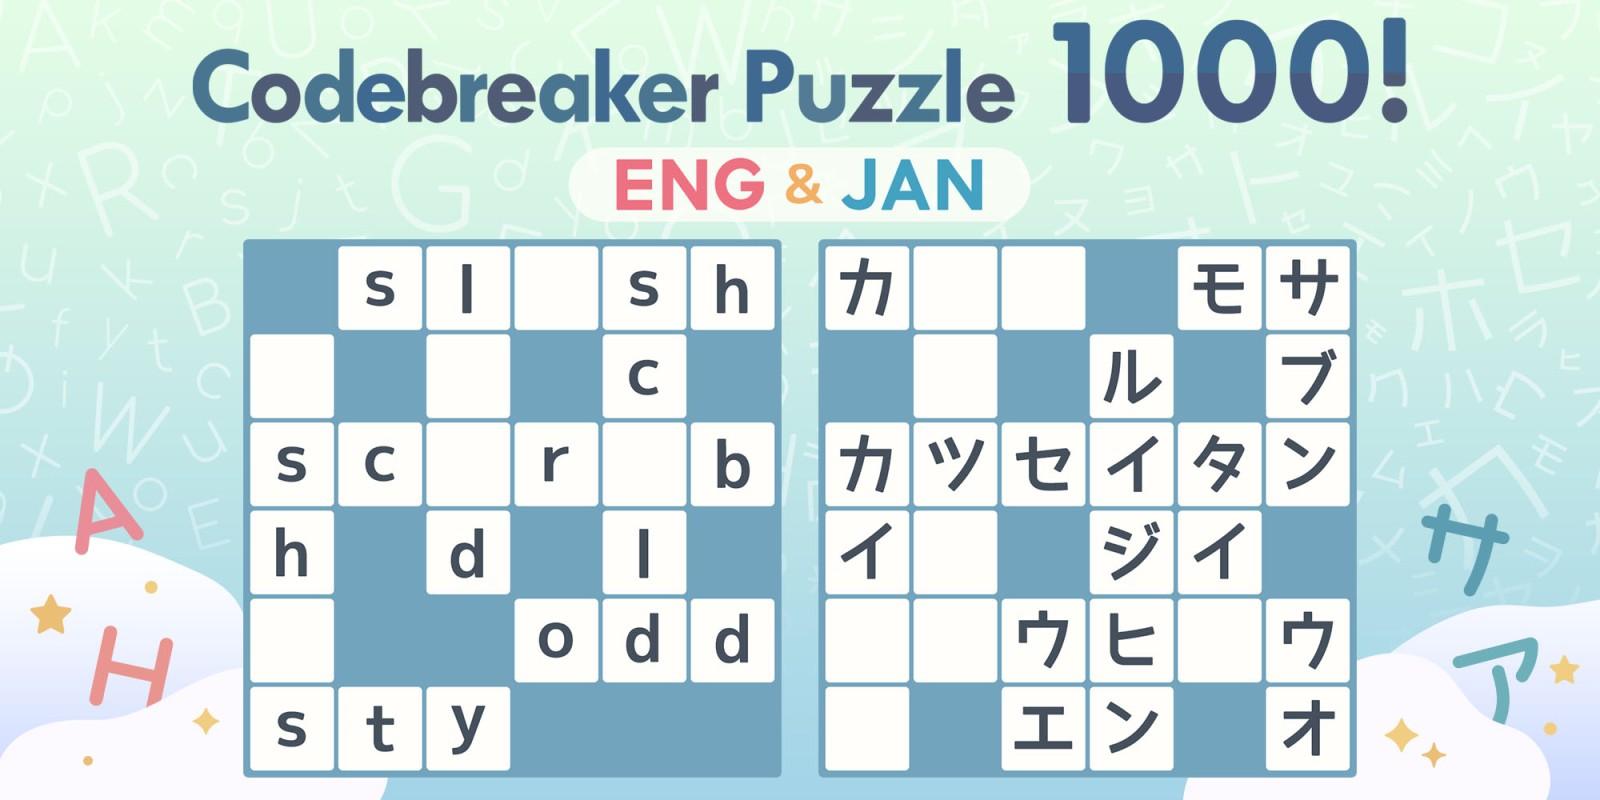 Codebreaker Puzzle 1000! ENG & JAN